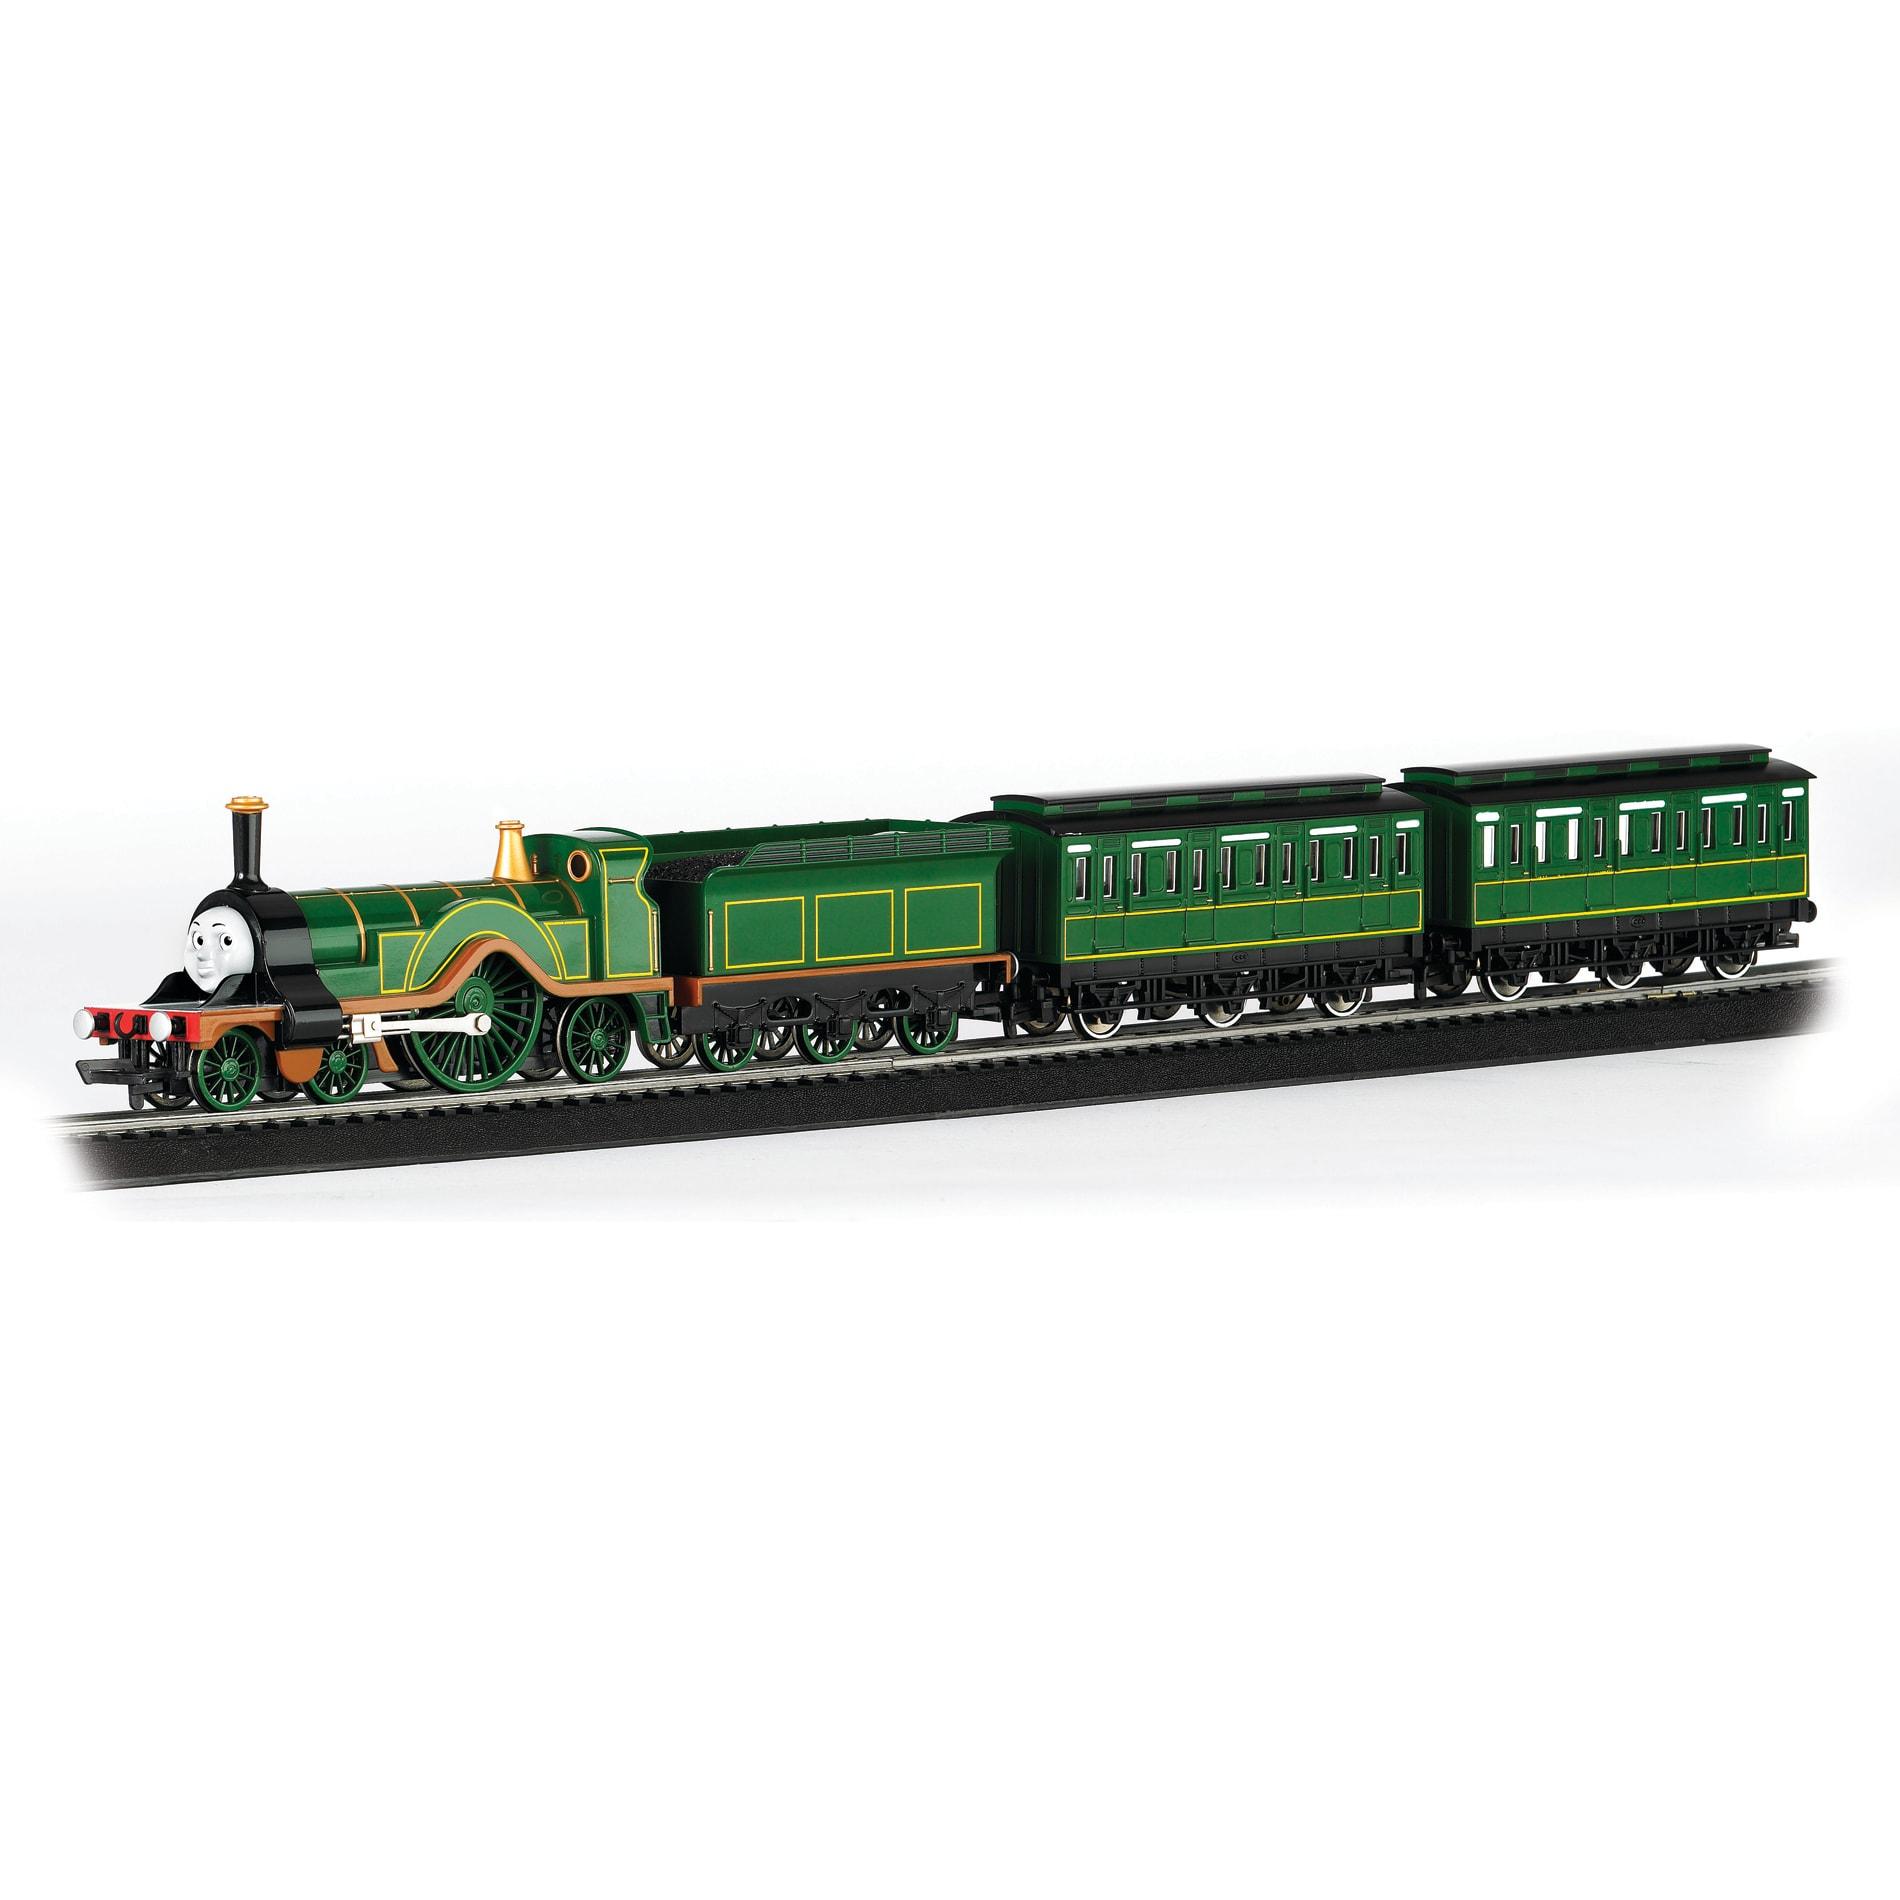 Bachmann HO Scale Thomas and Friends Emily Passenger Train Set